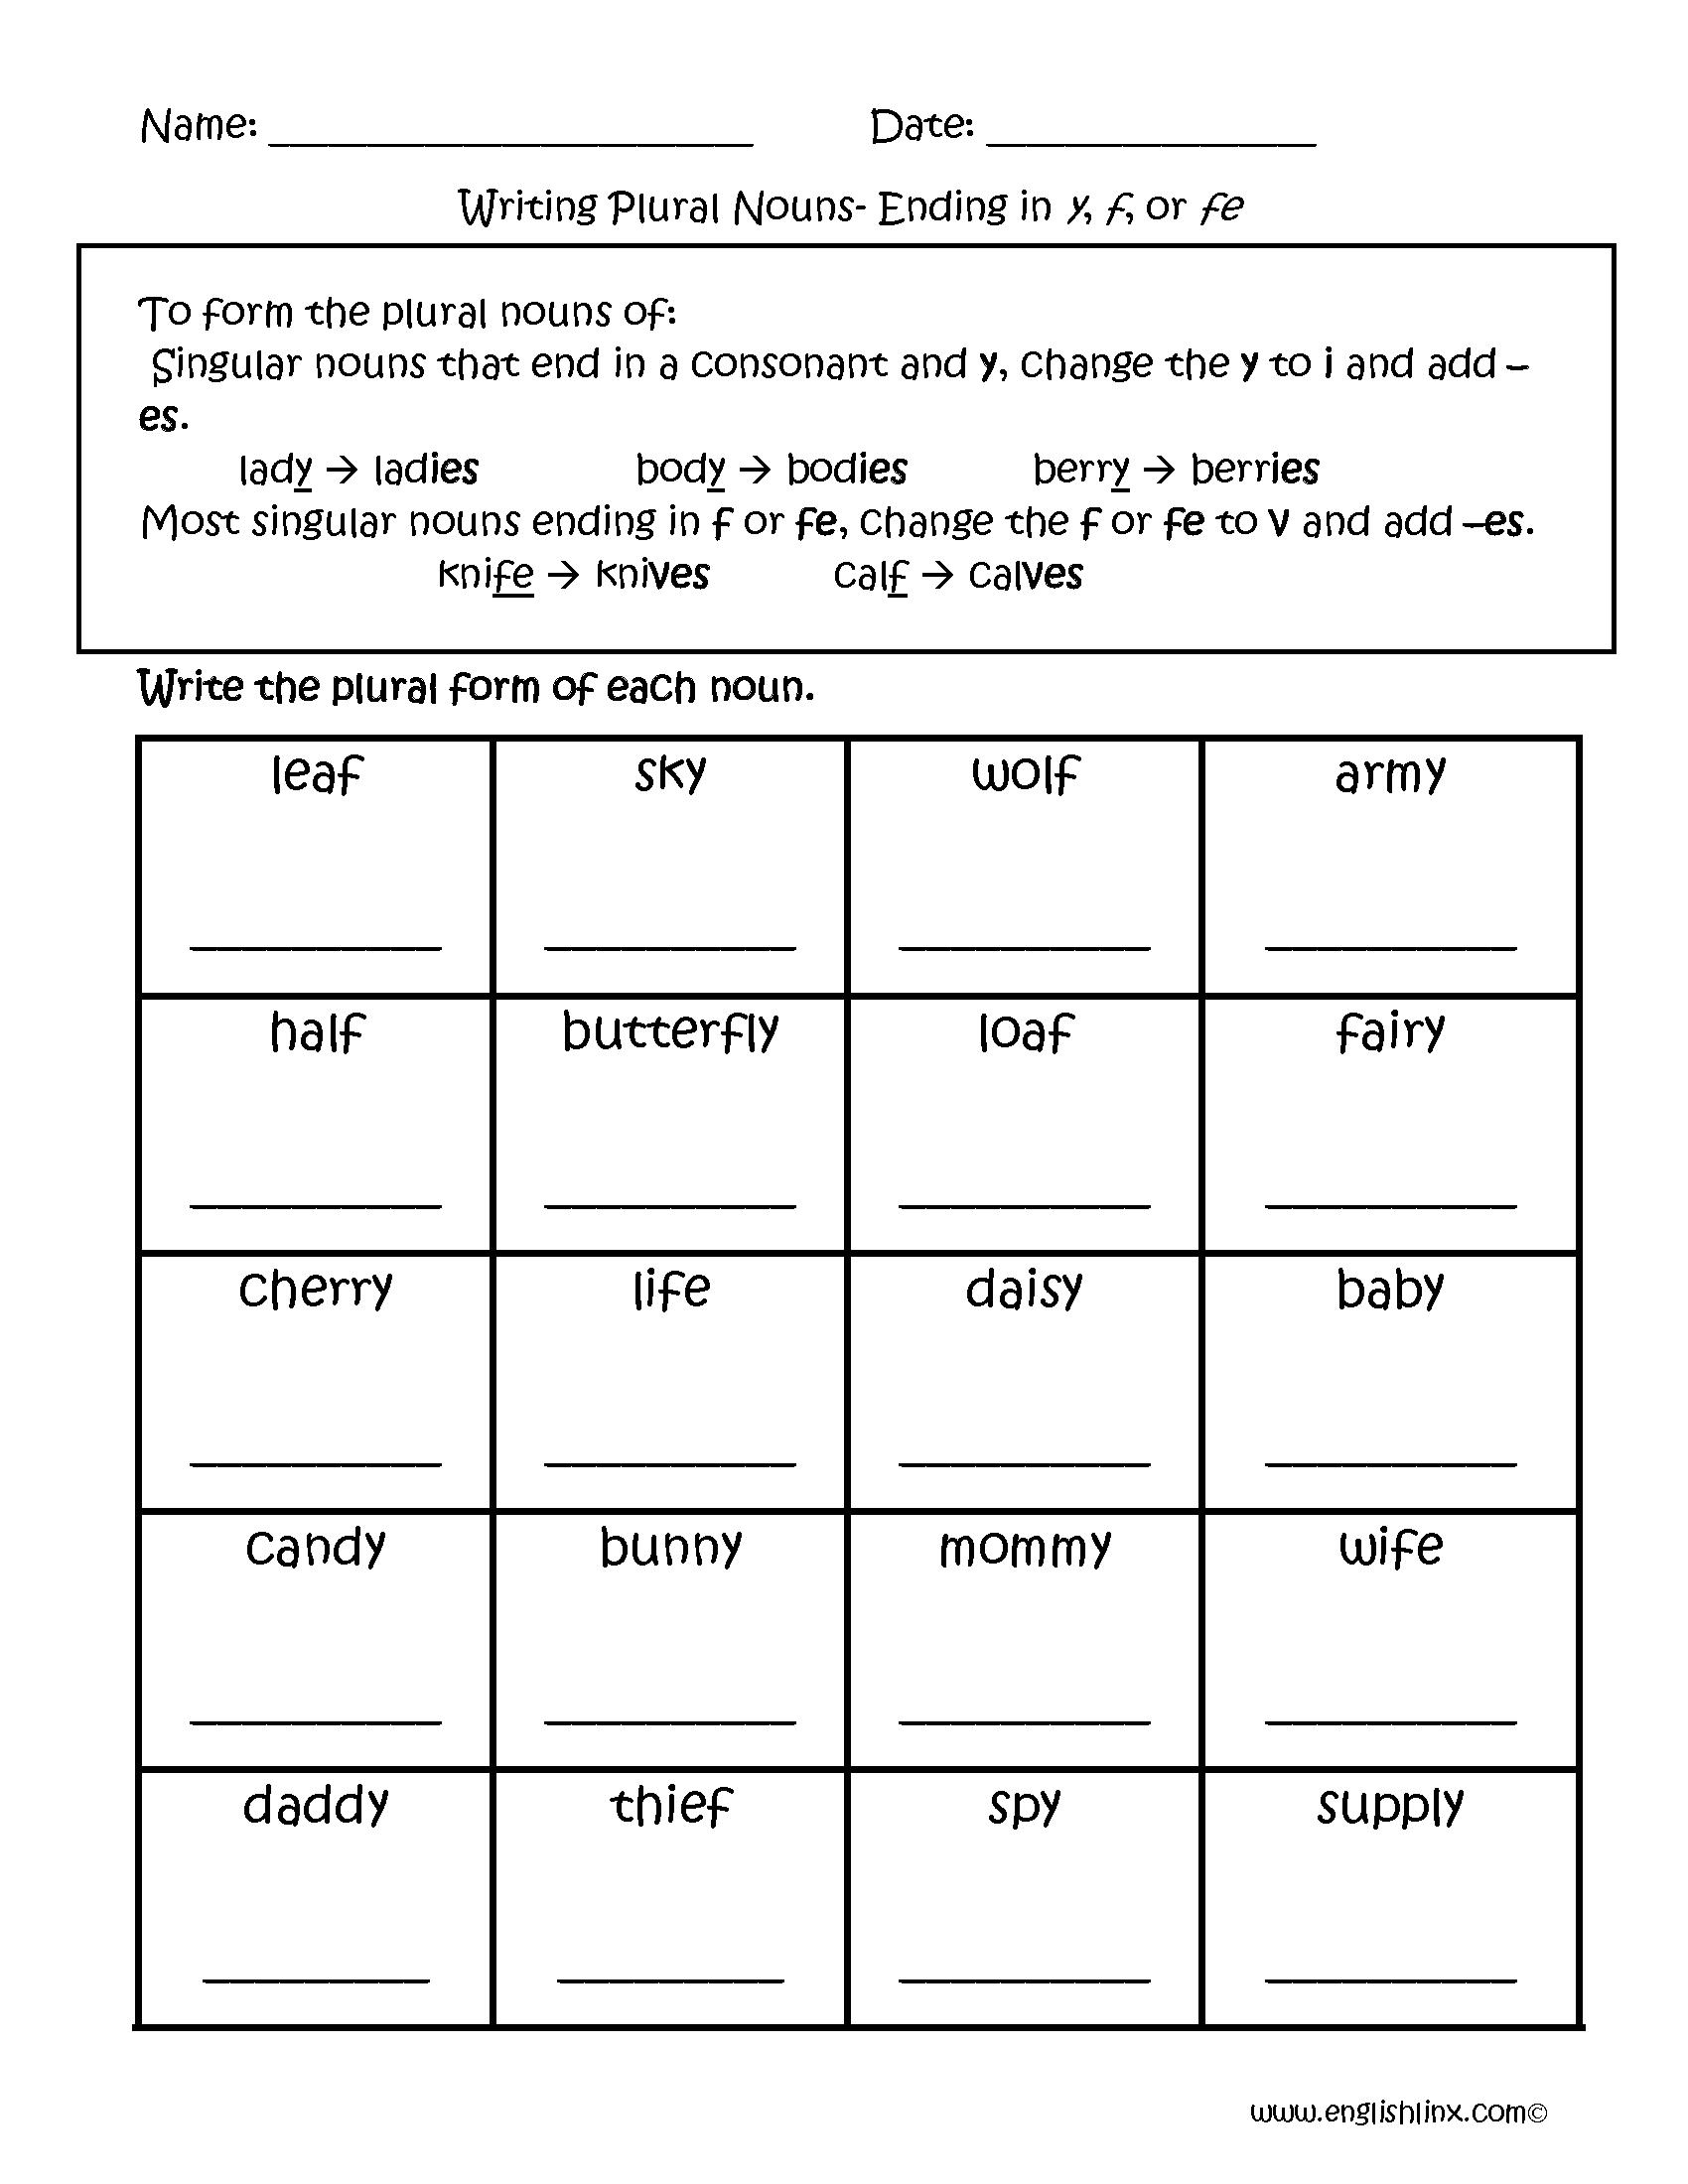 Printable Plural Noun Worksheets The Best Worksheets Image